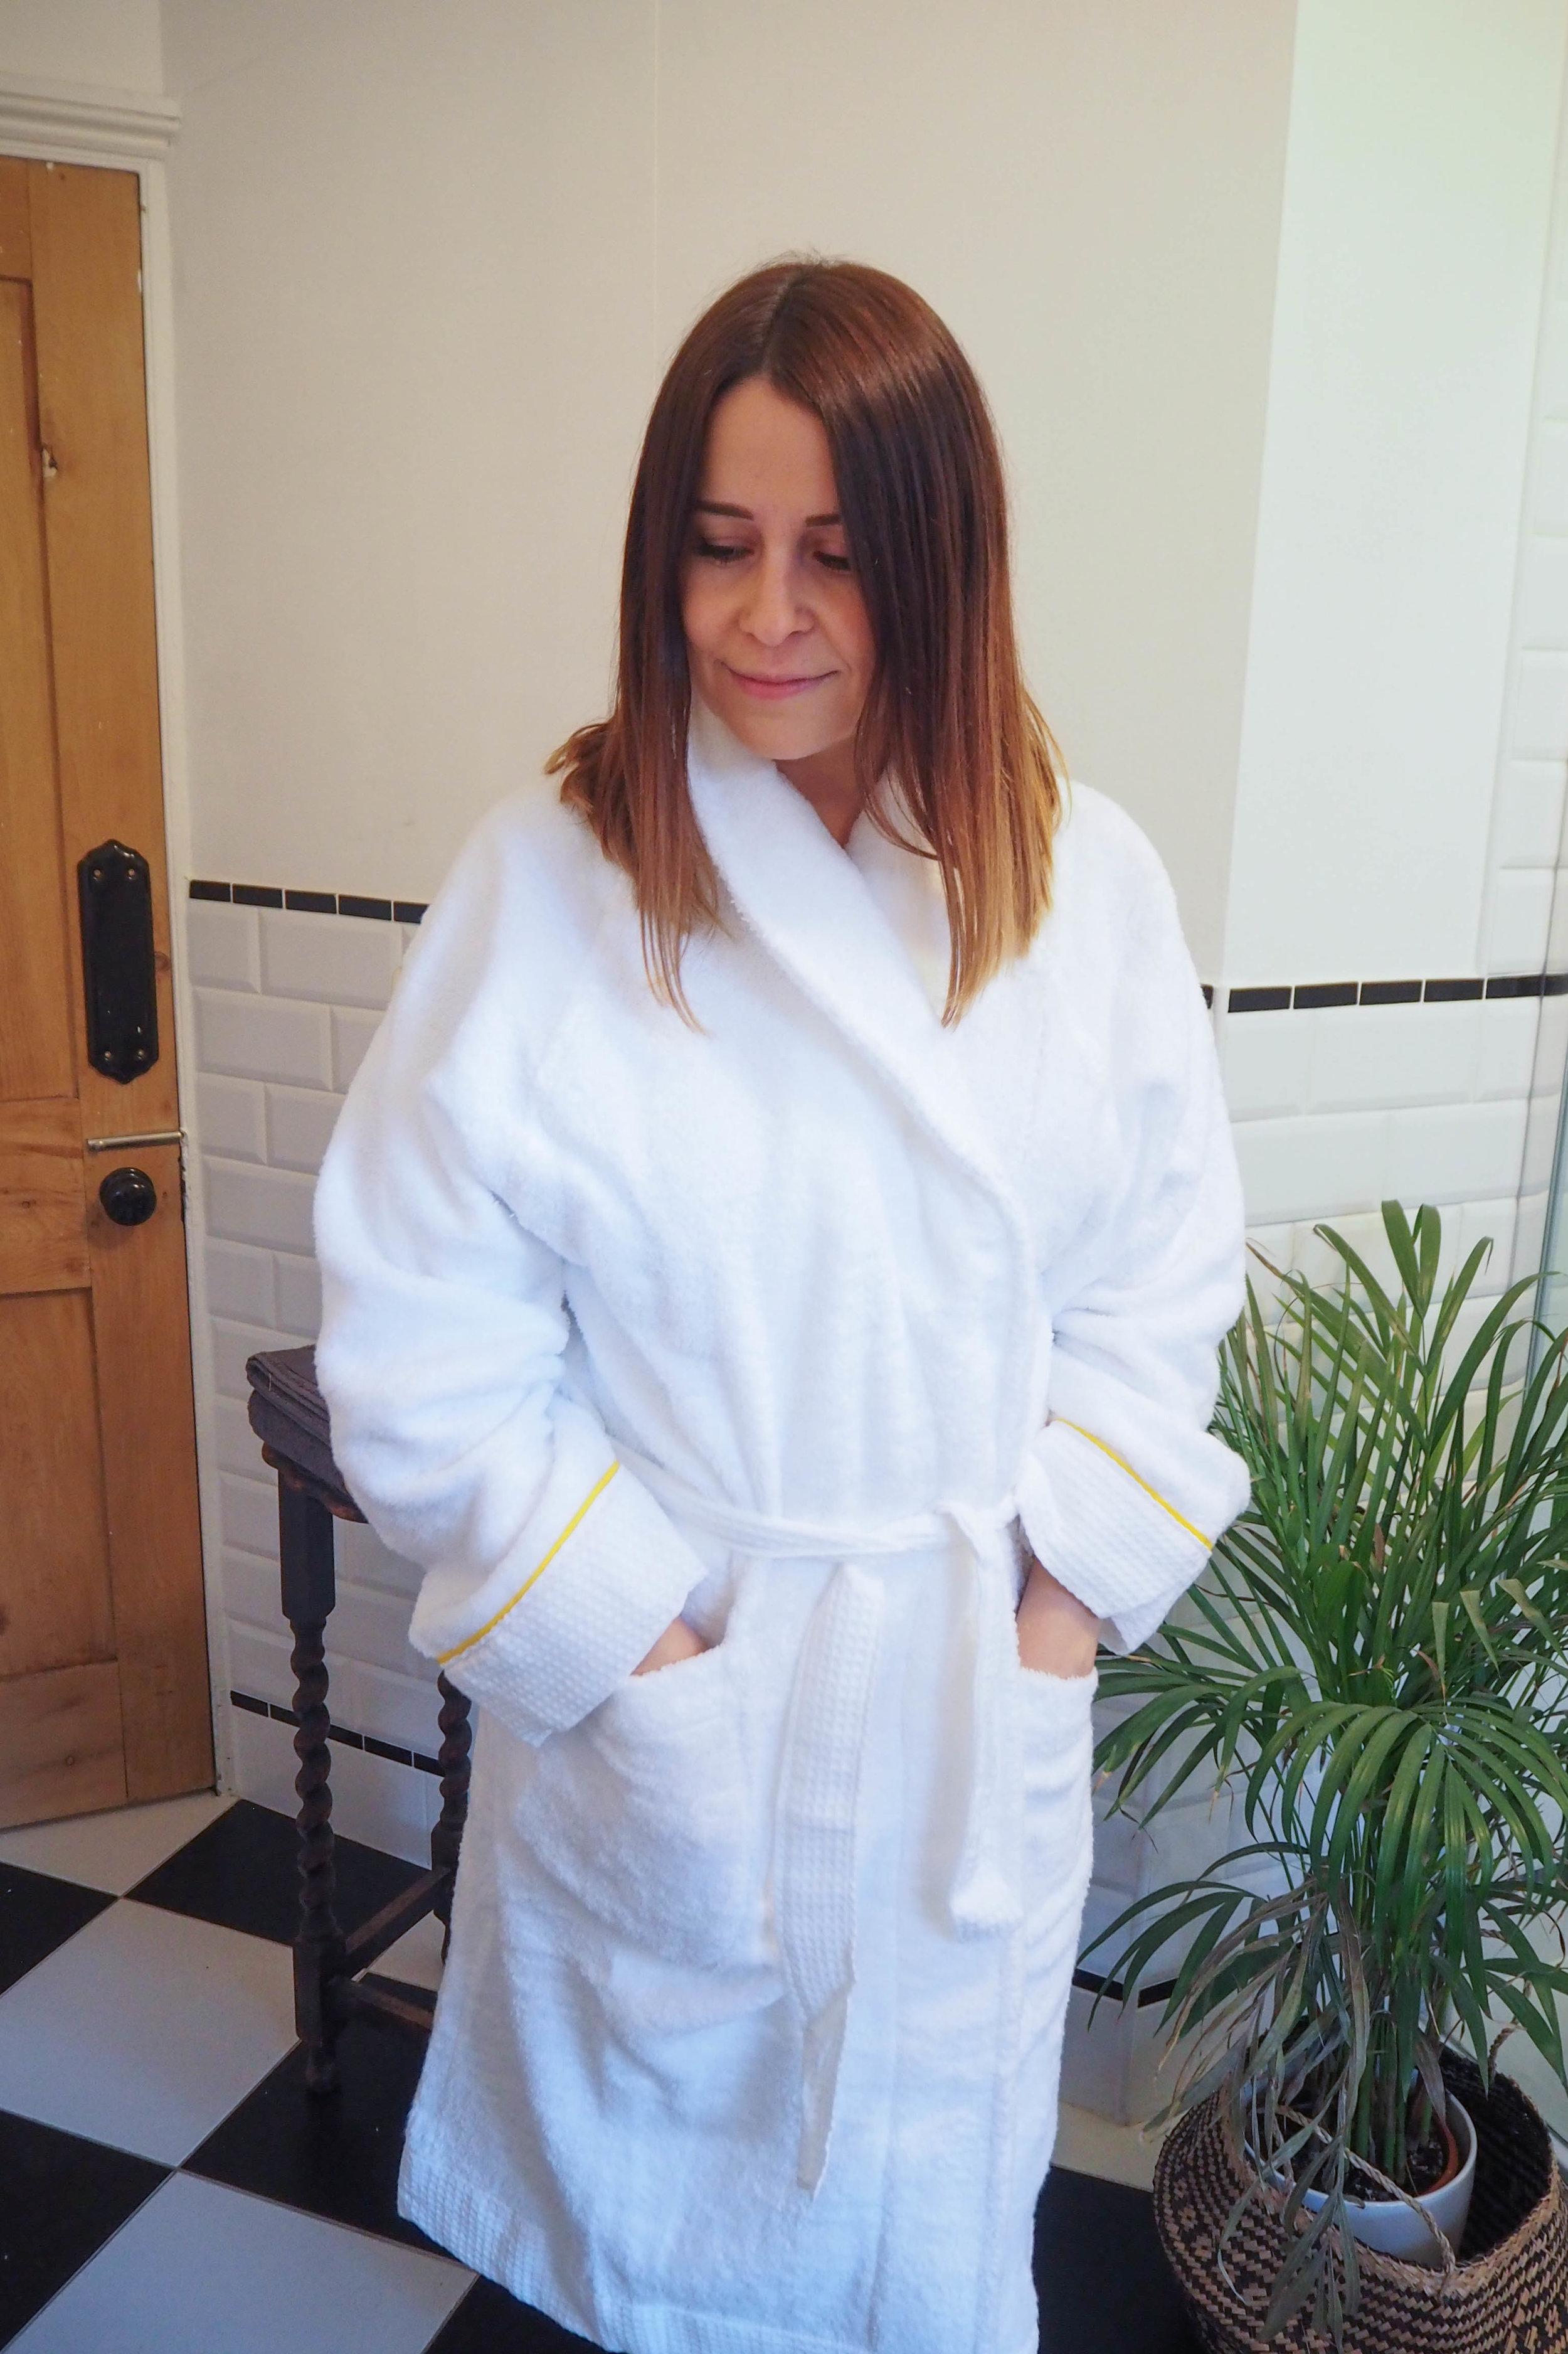 Eve Sleep towels